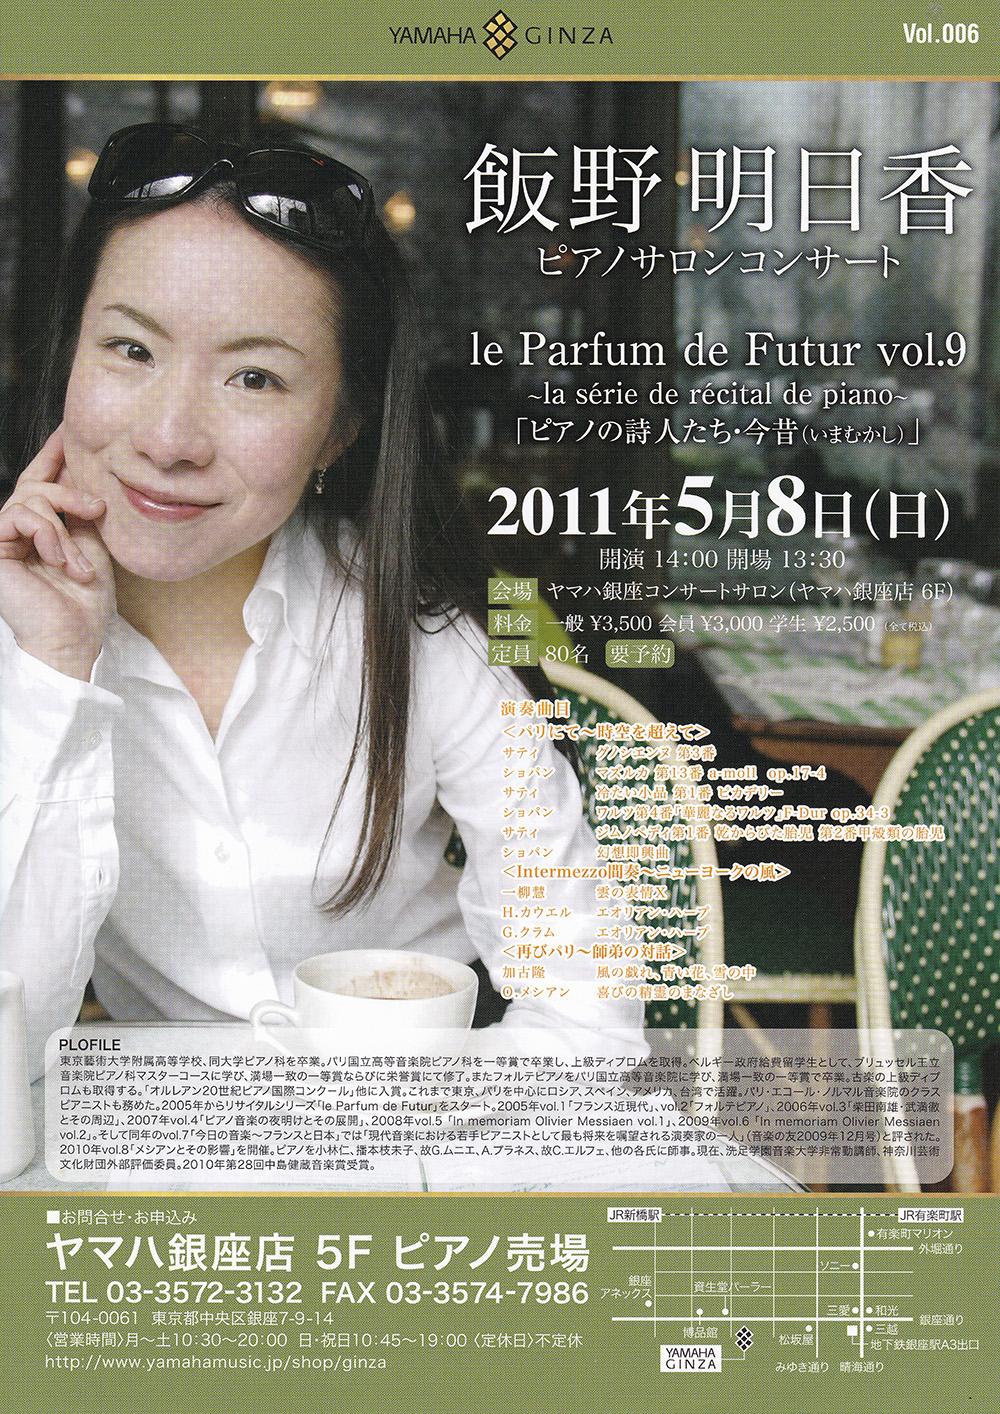 le Parfum de Futur vol.9「ピアノの詩人たち・今昔(いまむかし)」